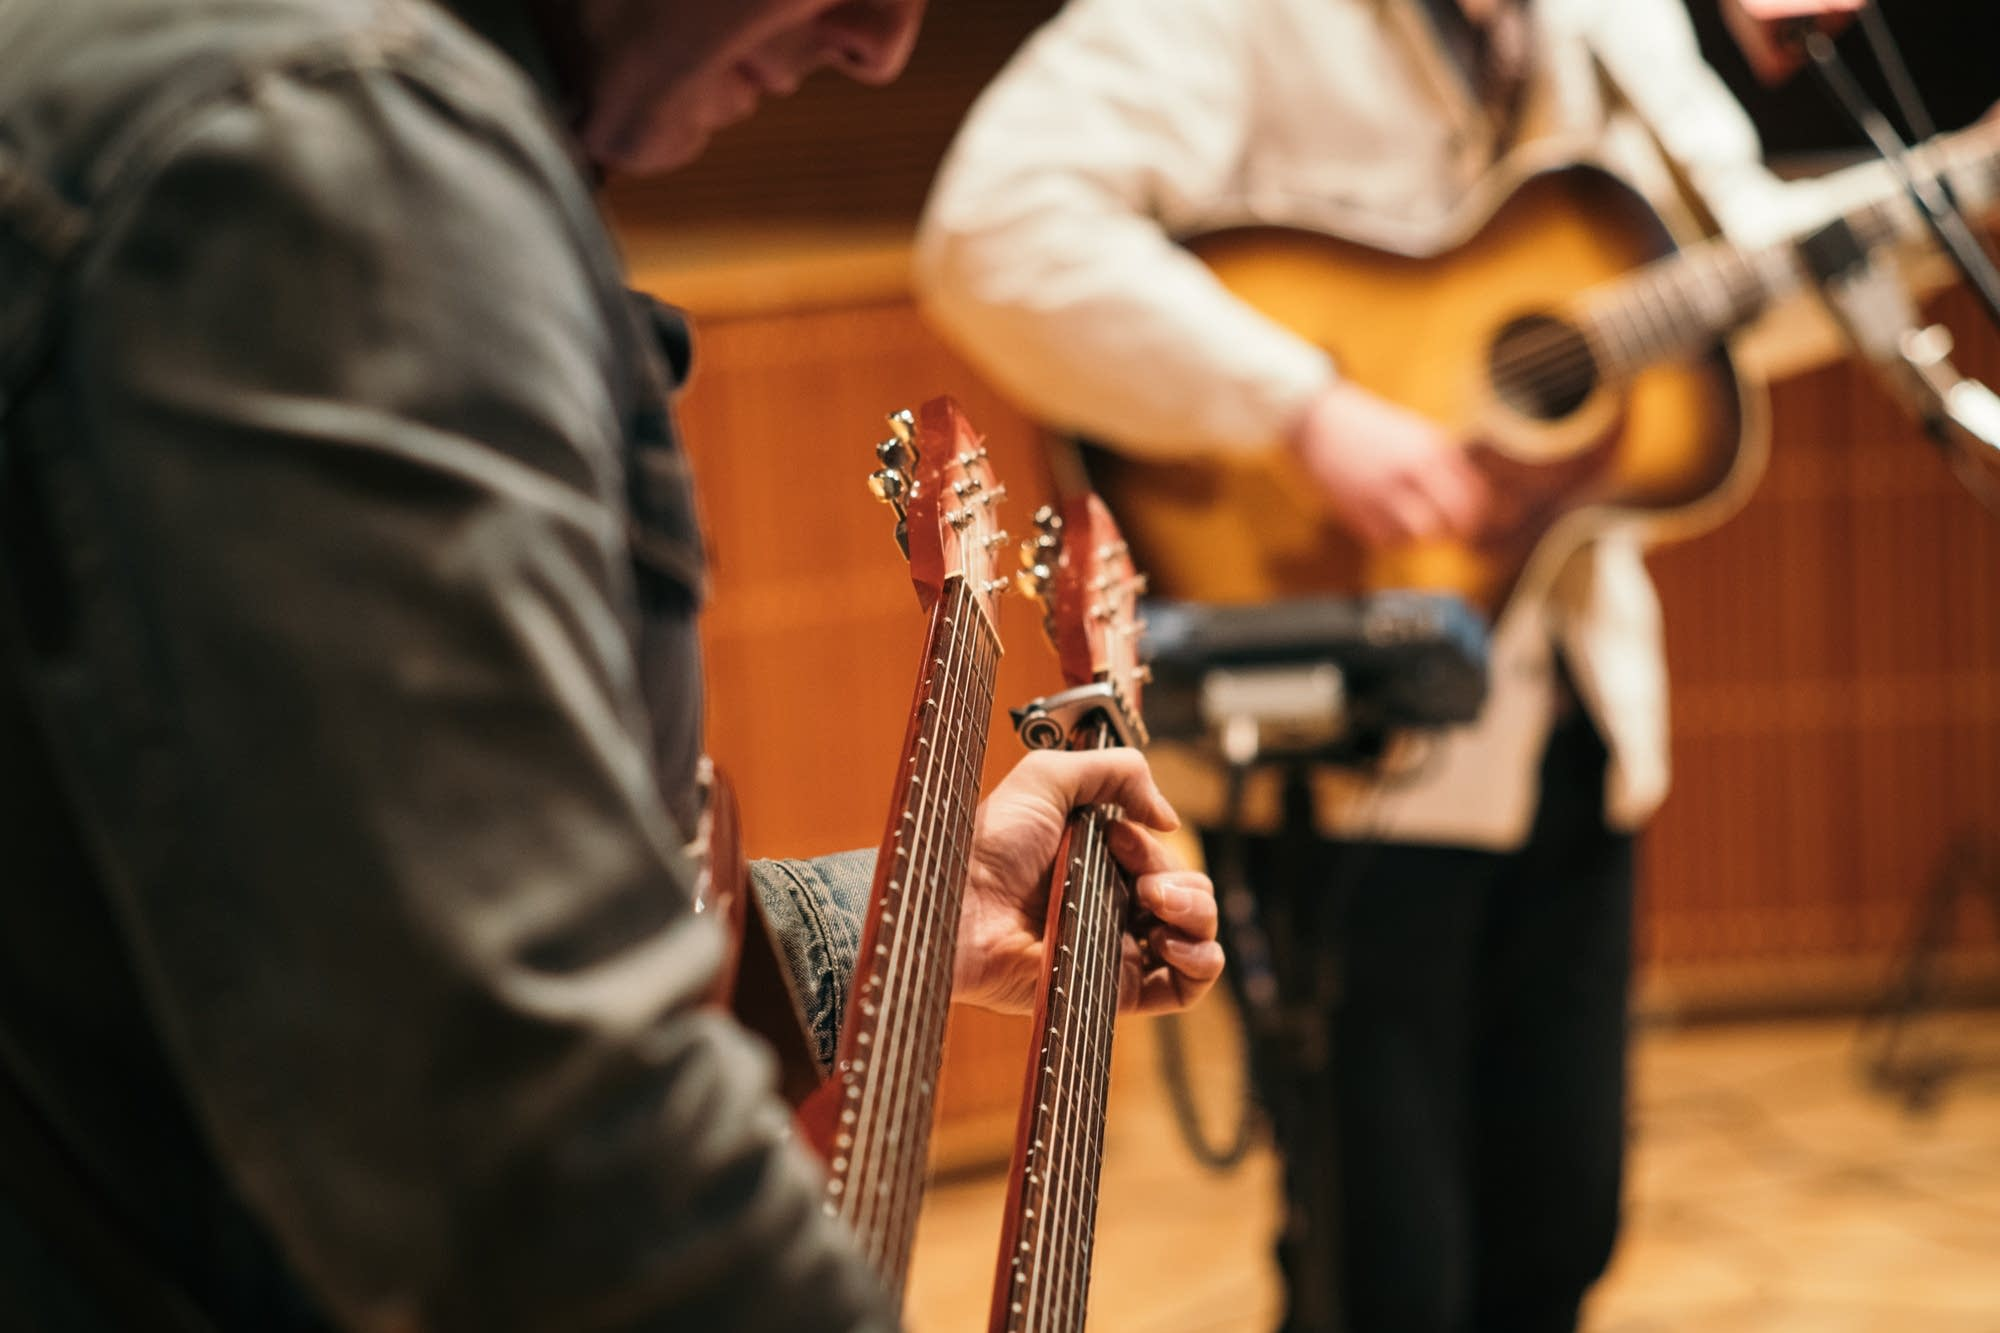 Tyler Burkum's double-neck guitar